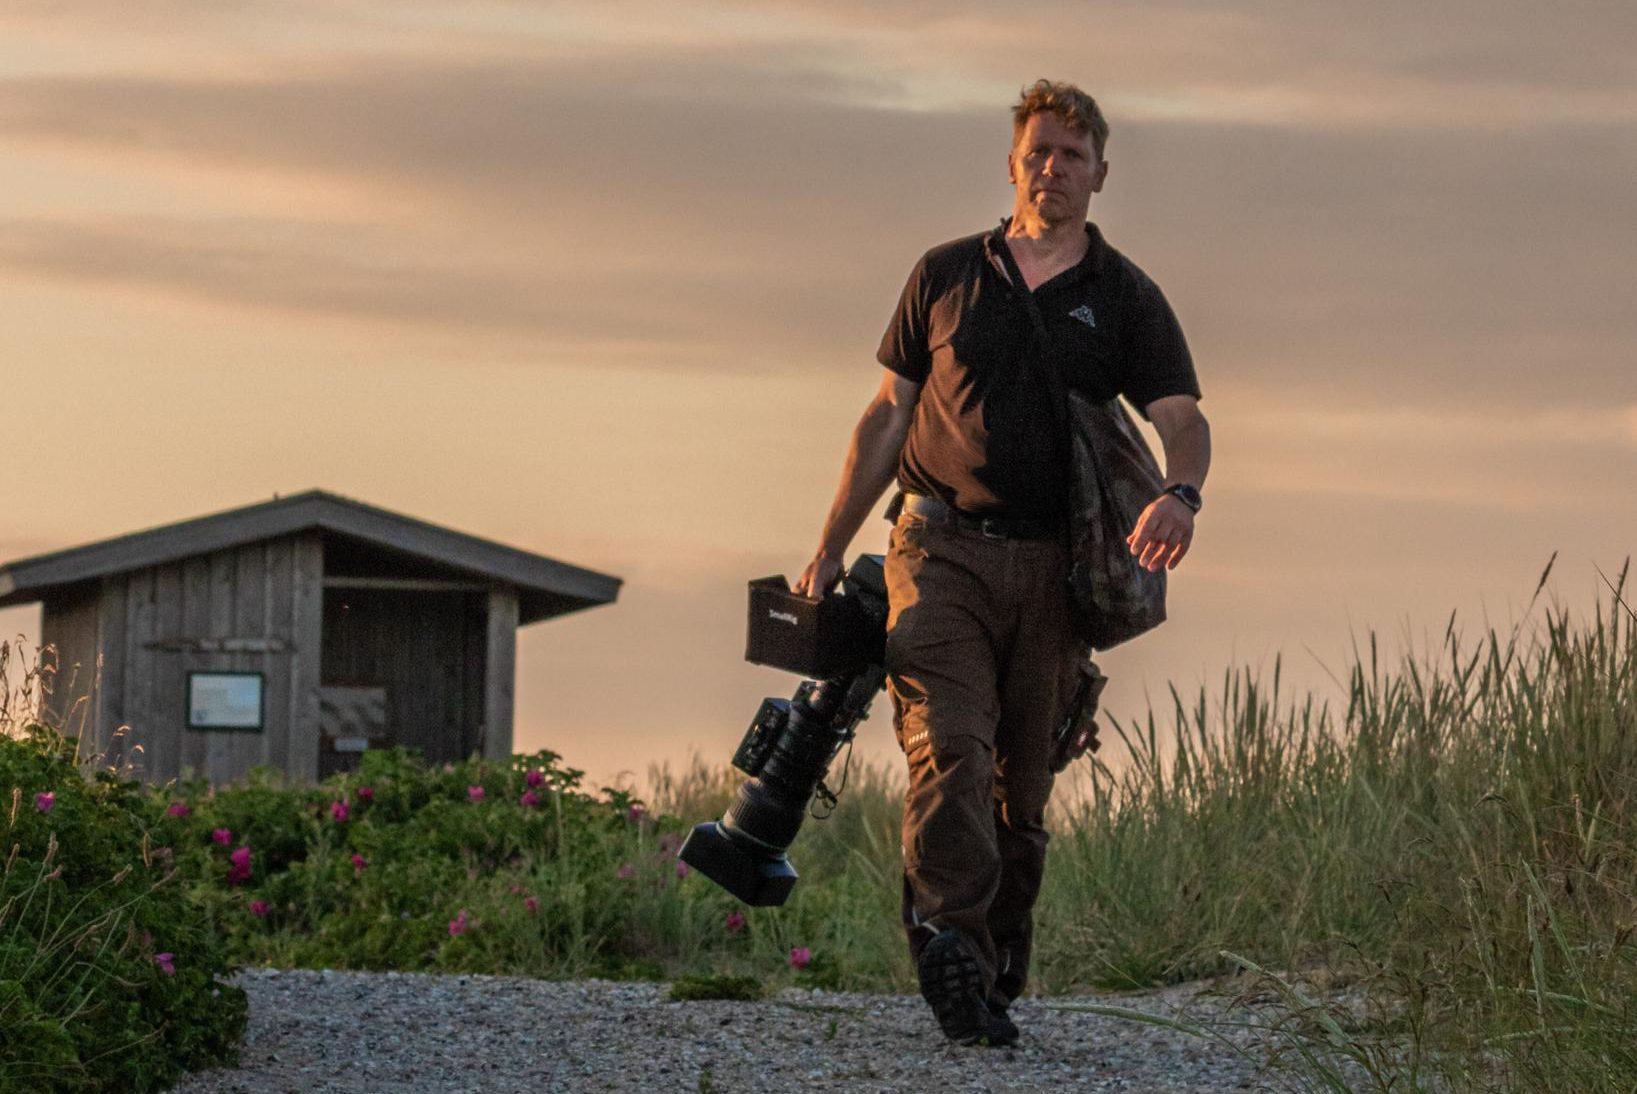 Tierfilmer Jens Klingebiel  mit Kamera